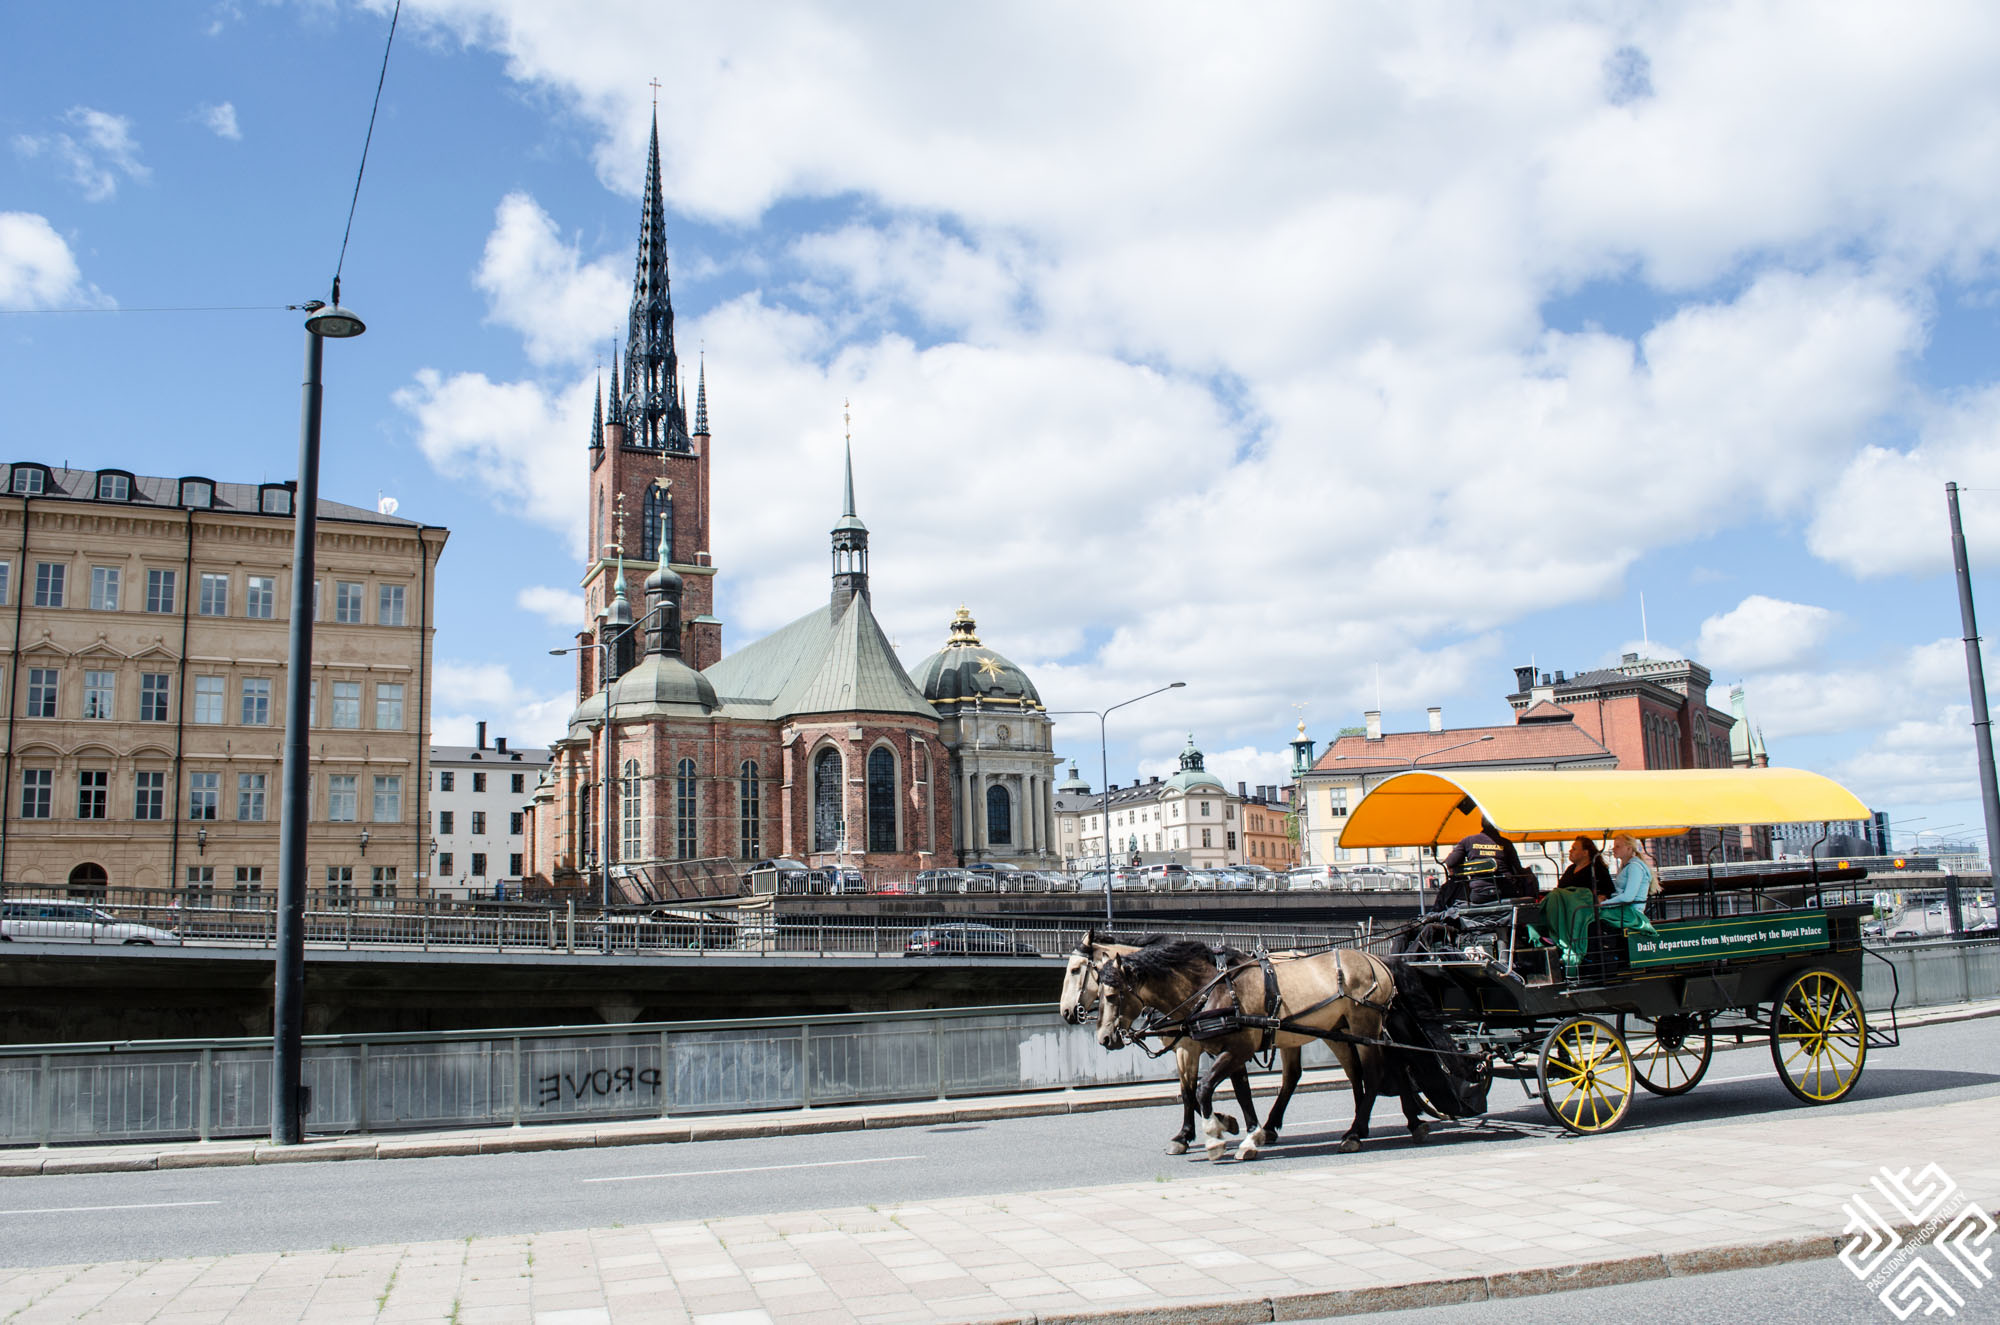 stockholm-architecture-1